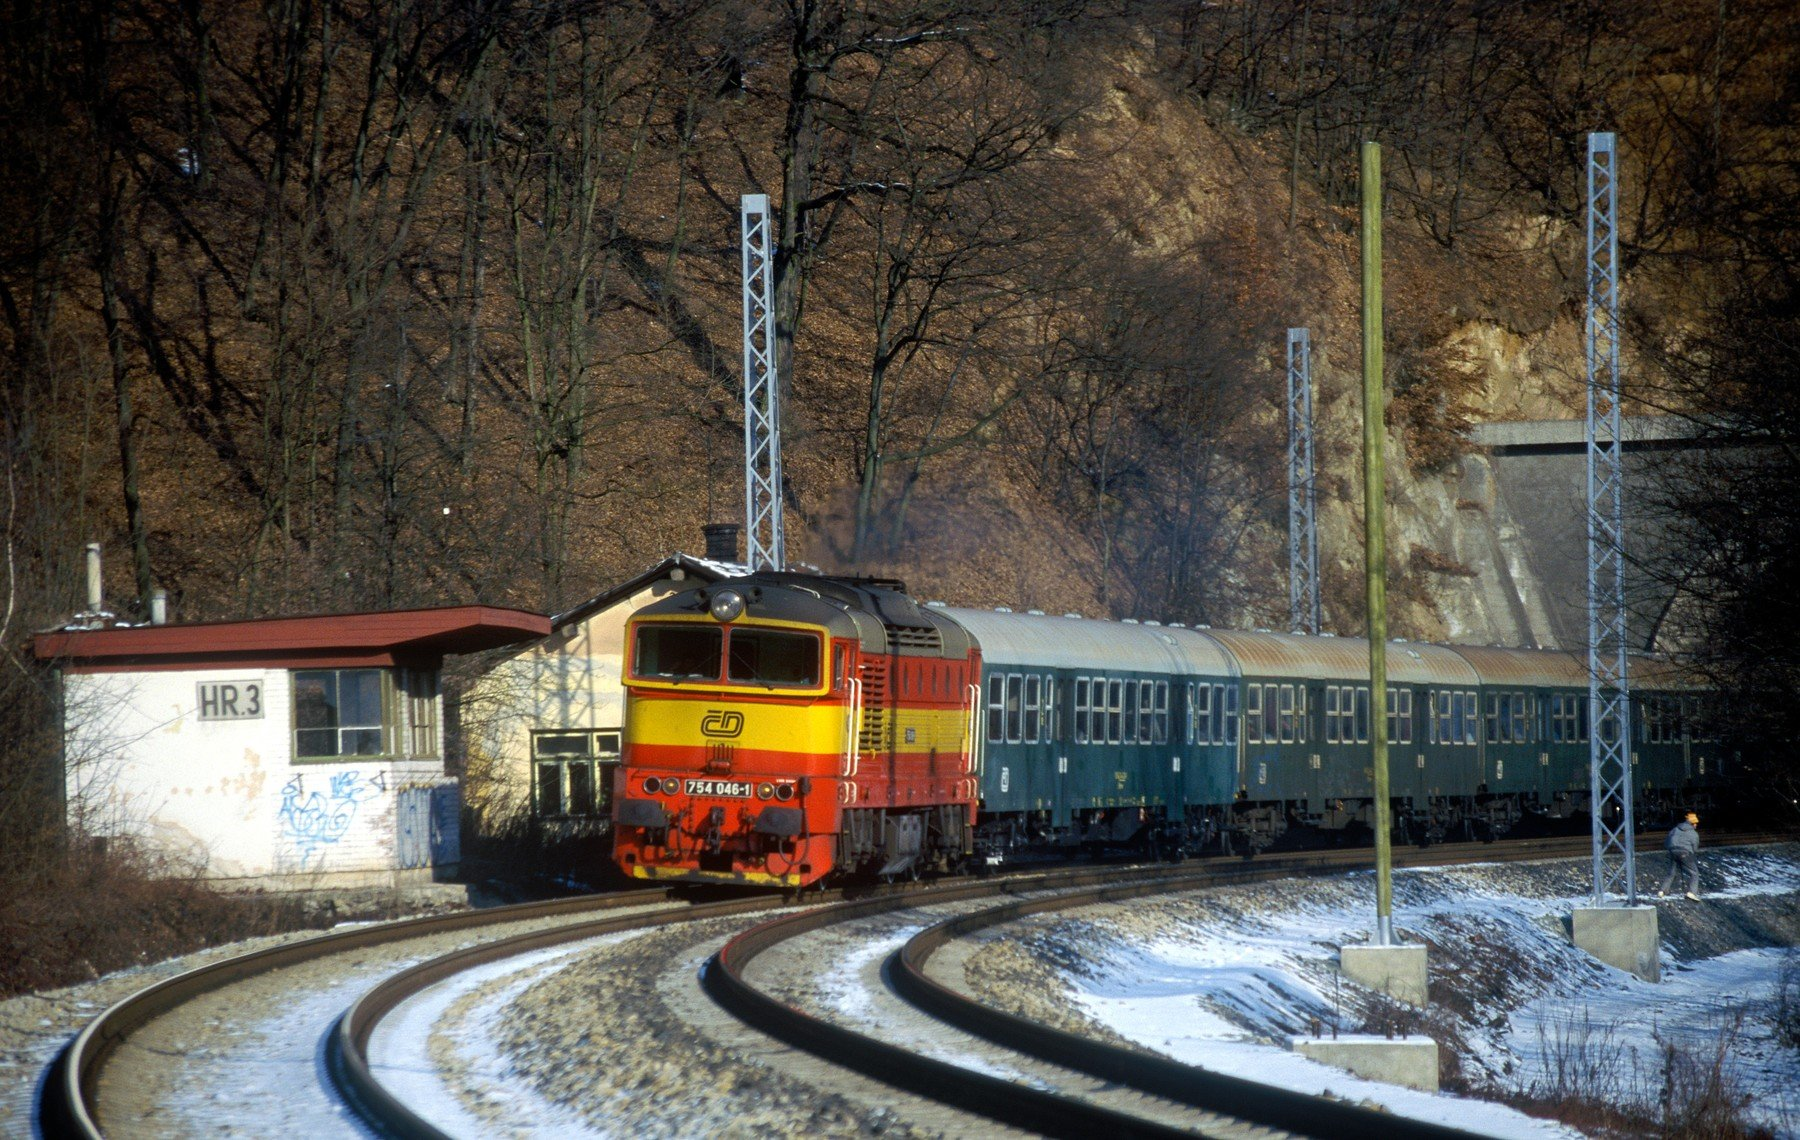 Vlak na trase mezi Babicemi a Bílovicemi nad Svitavou